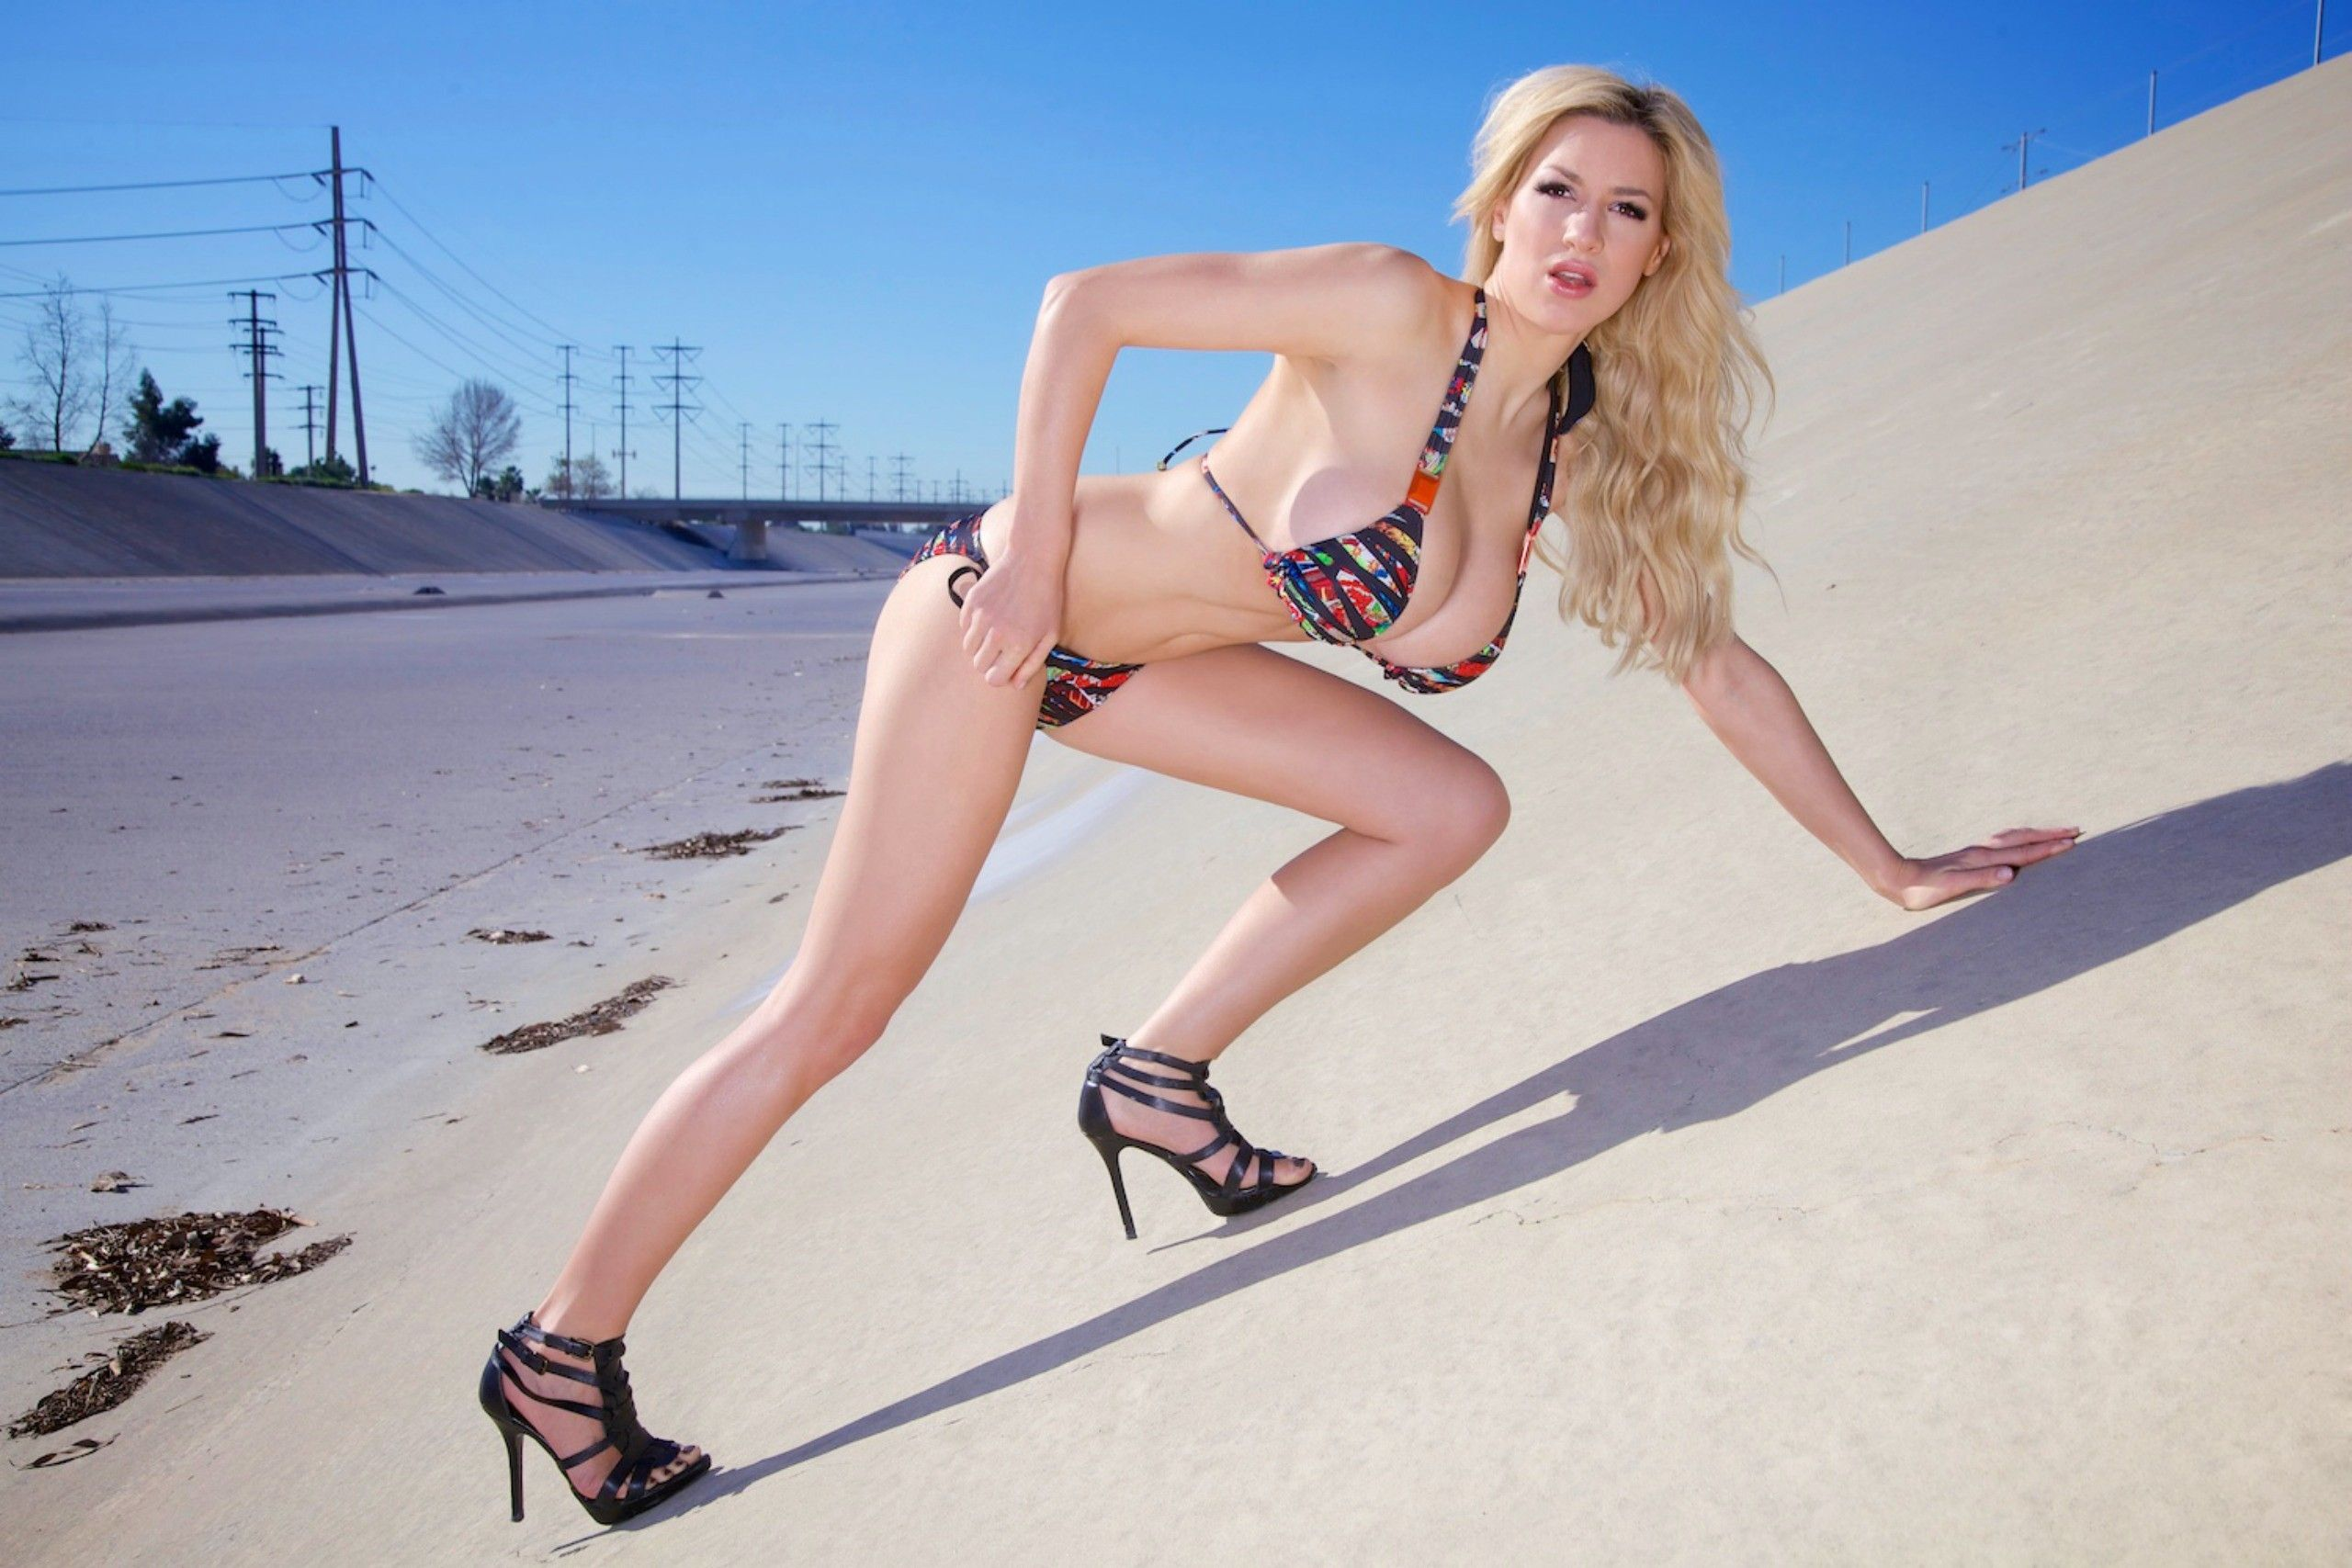 Jordan Wallpaper Iphone X Girl In Bikini Hd Wallpapers High Definition Quality Hd